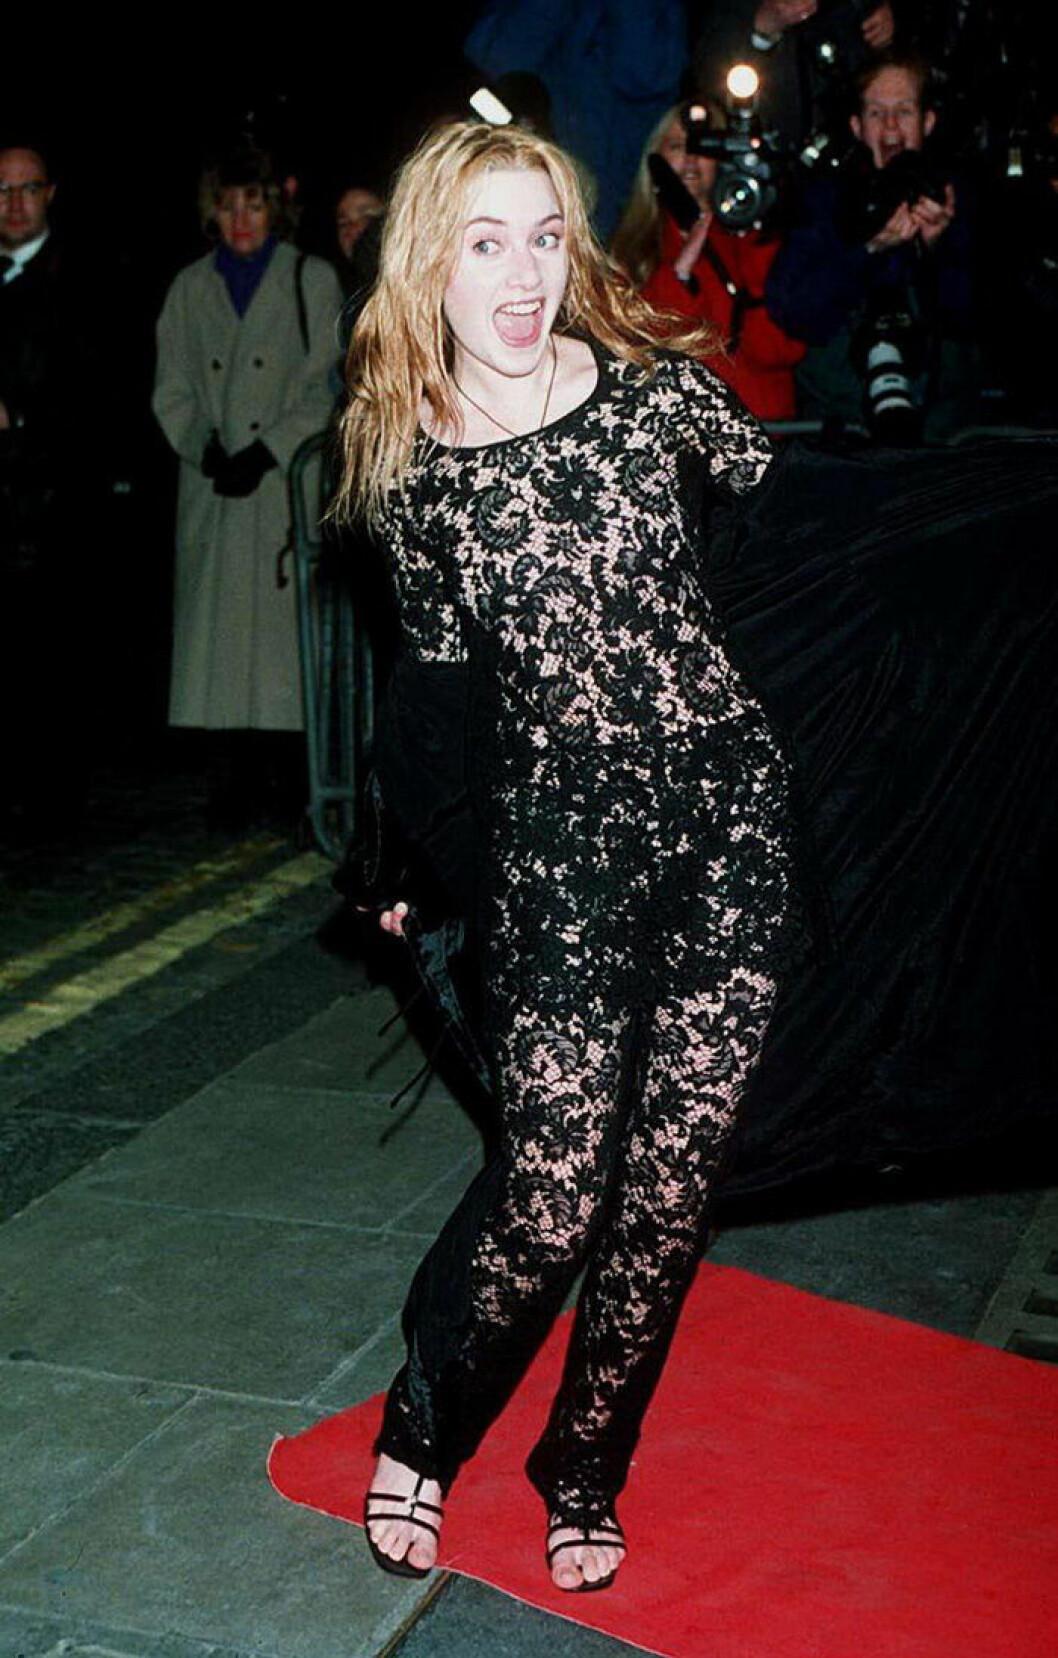 En bild på skådespelerskan Kate Winslet 1996.